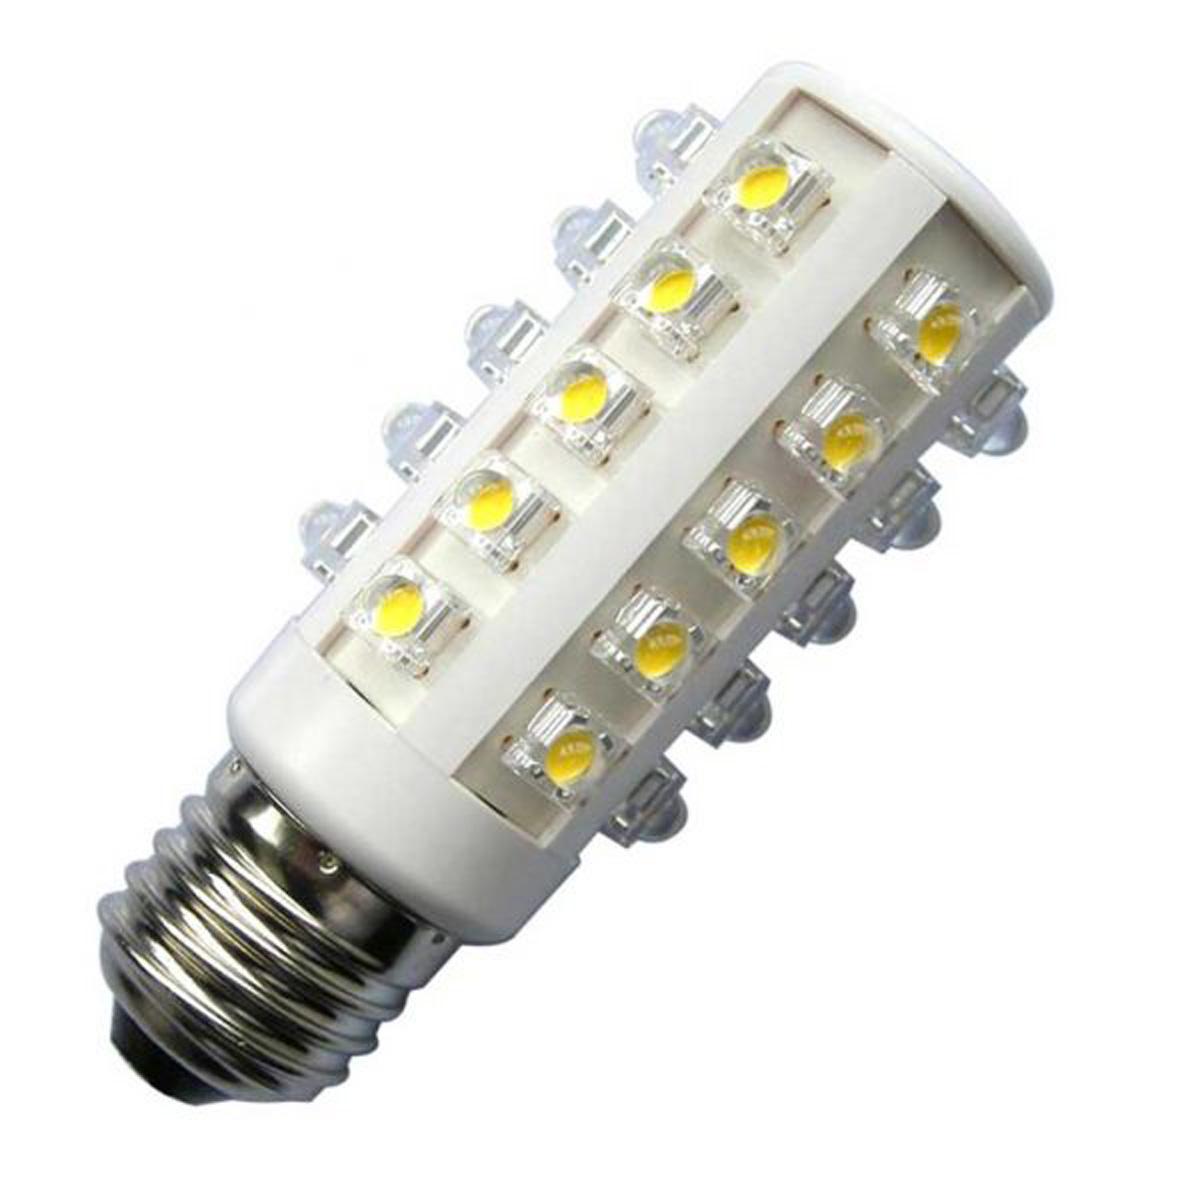 WSL-WW-120M Lamp Photo